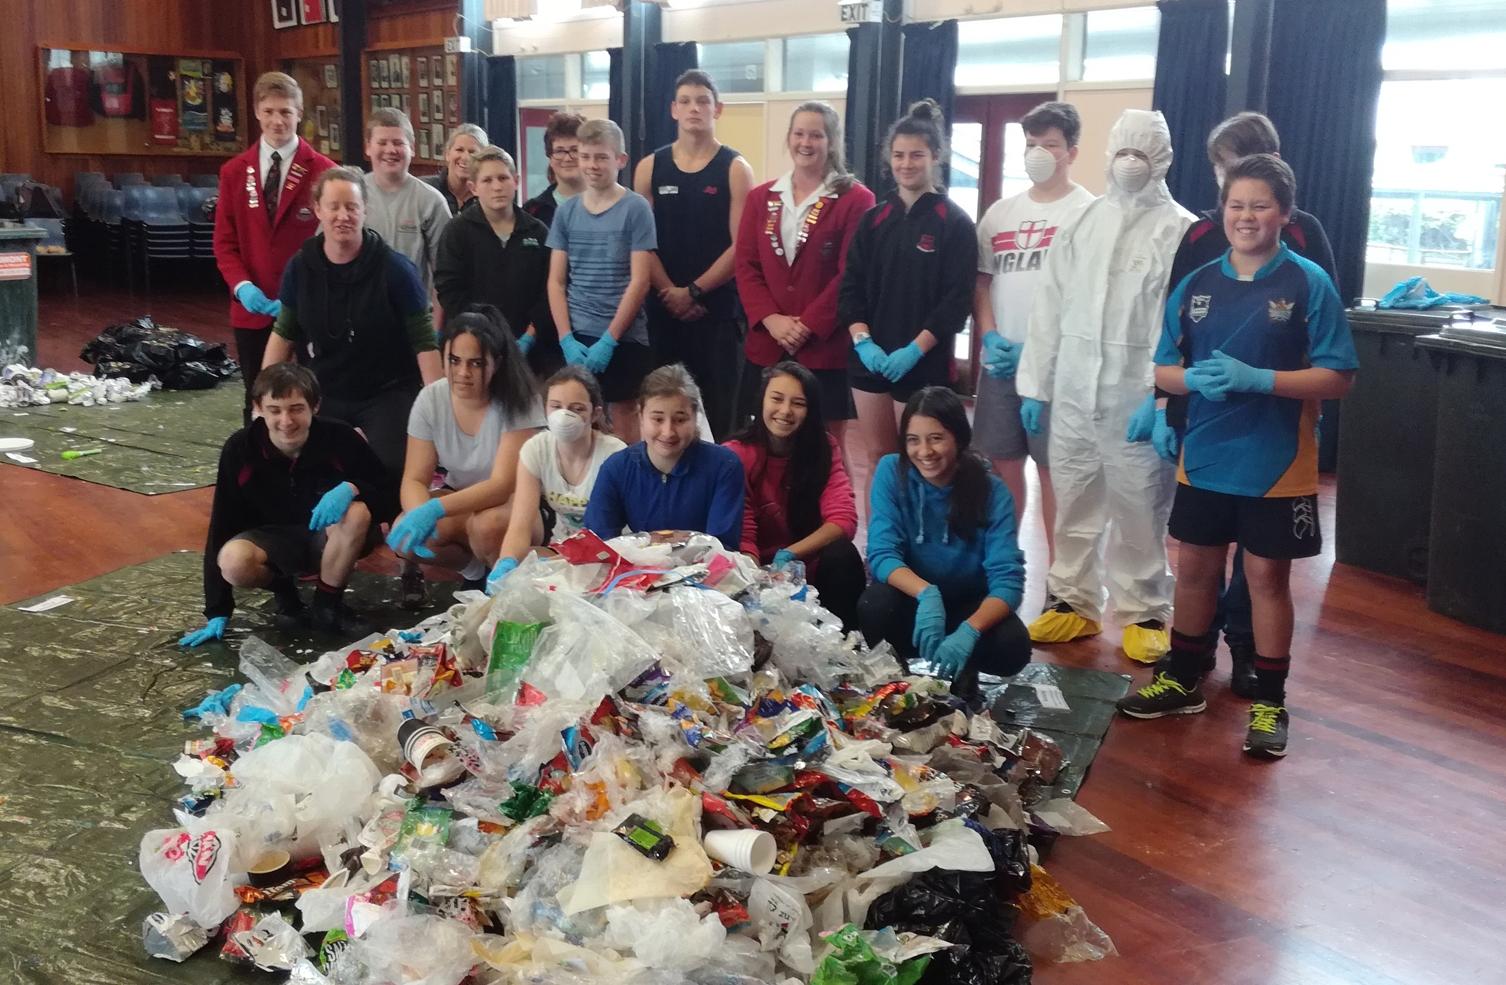 The waste plastics pile after the Stratford High waste audit.